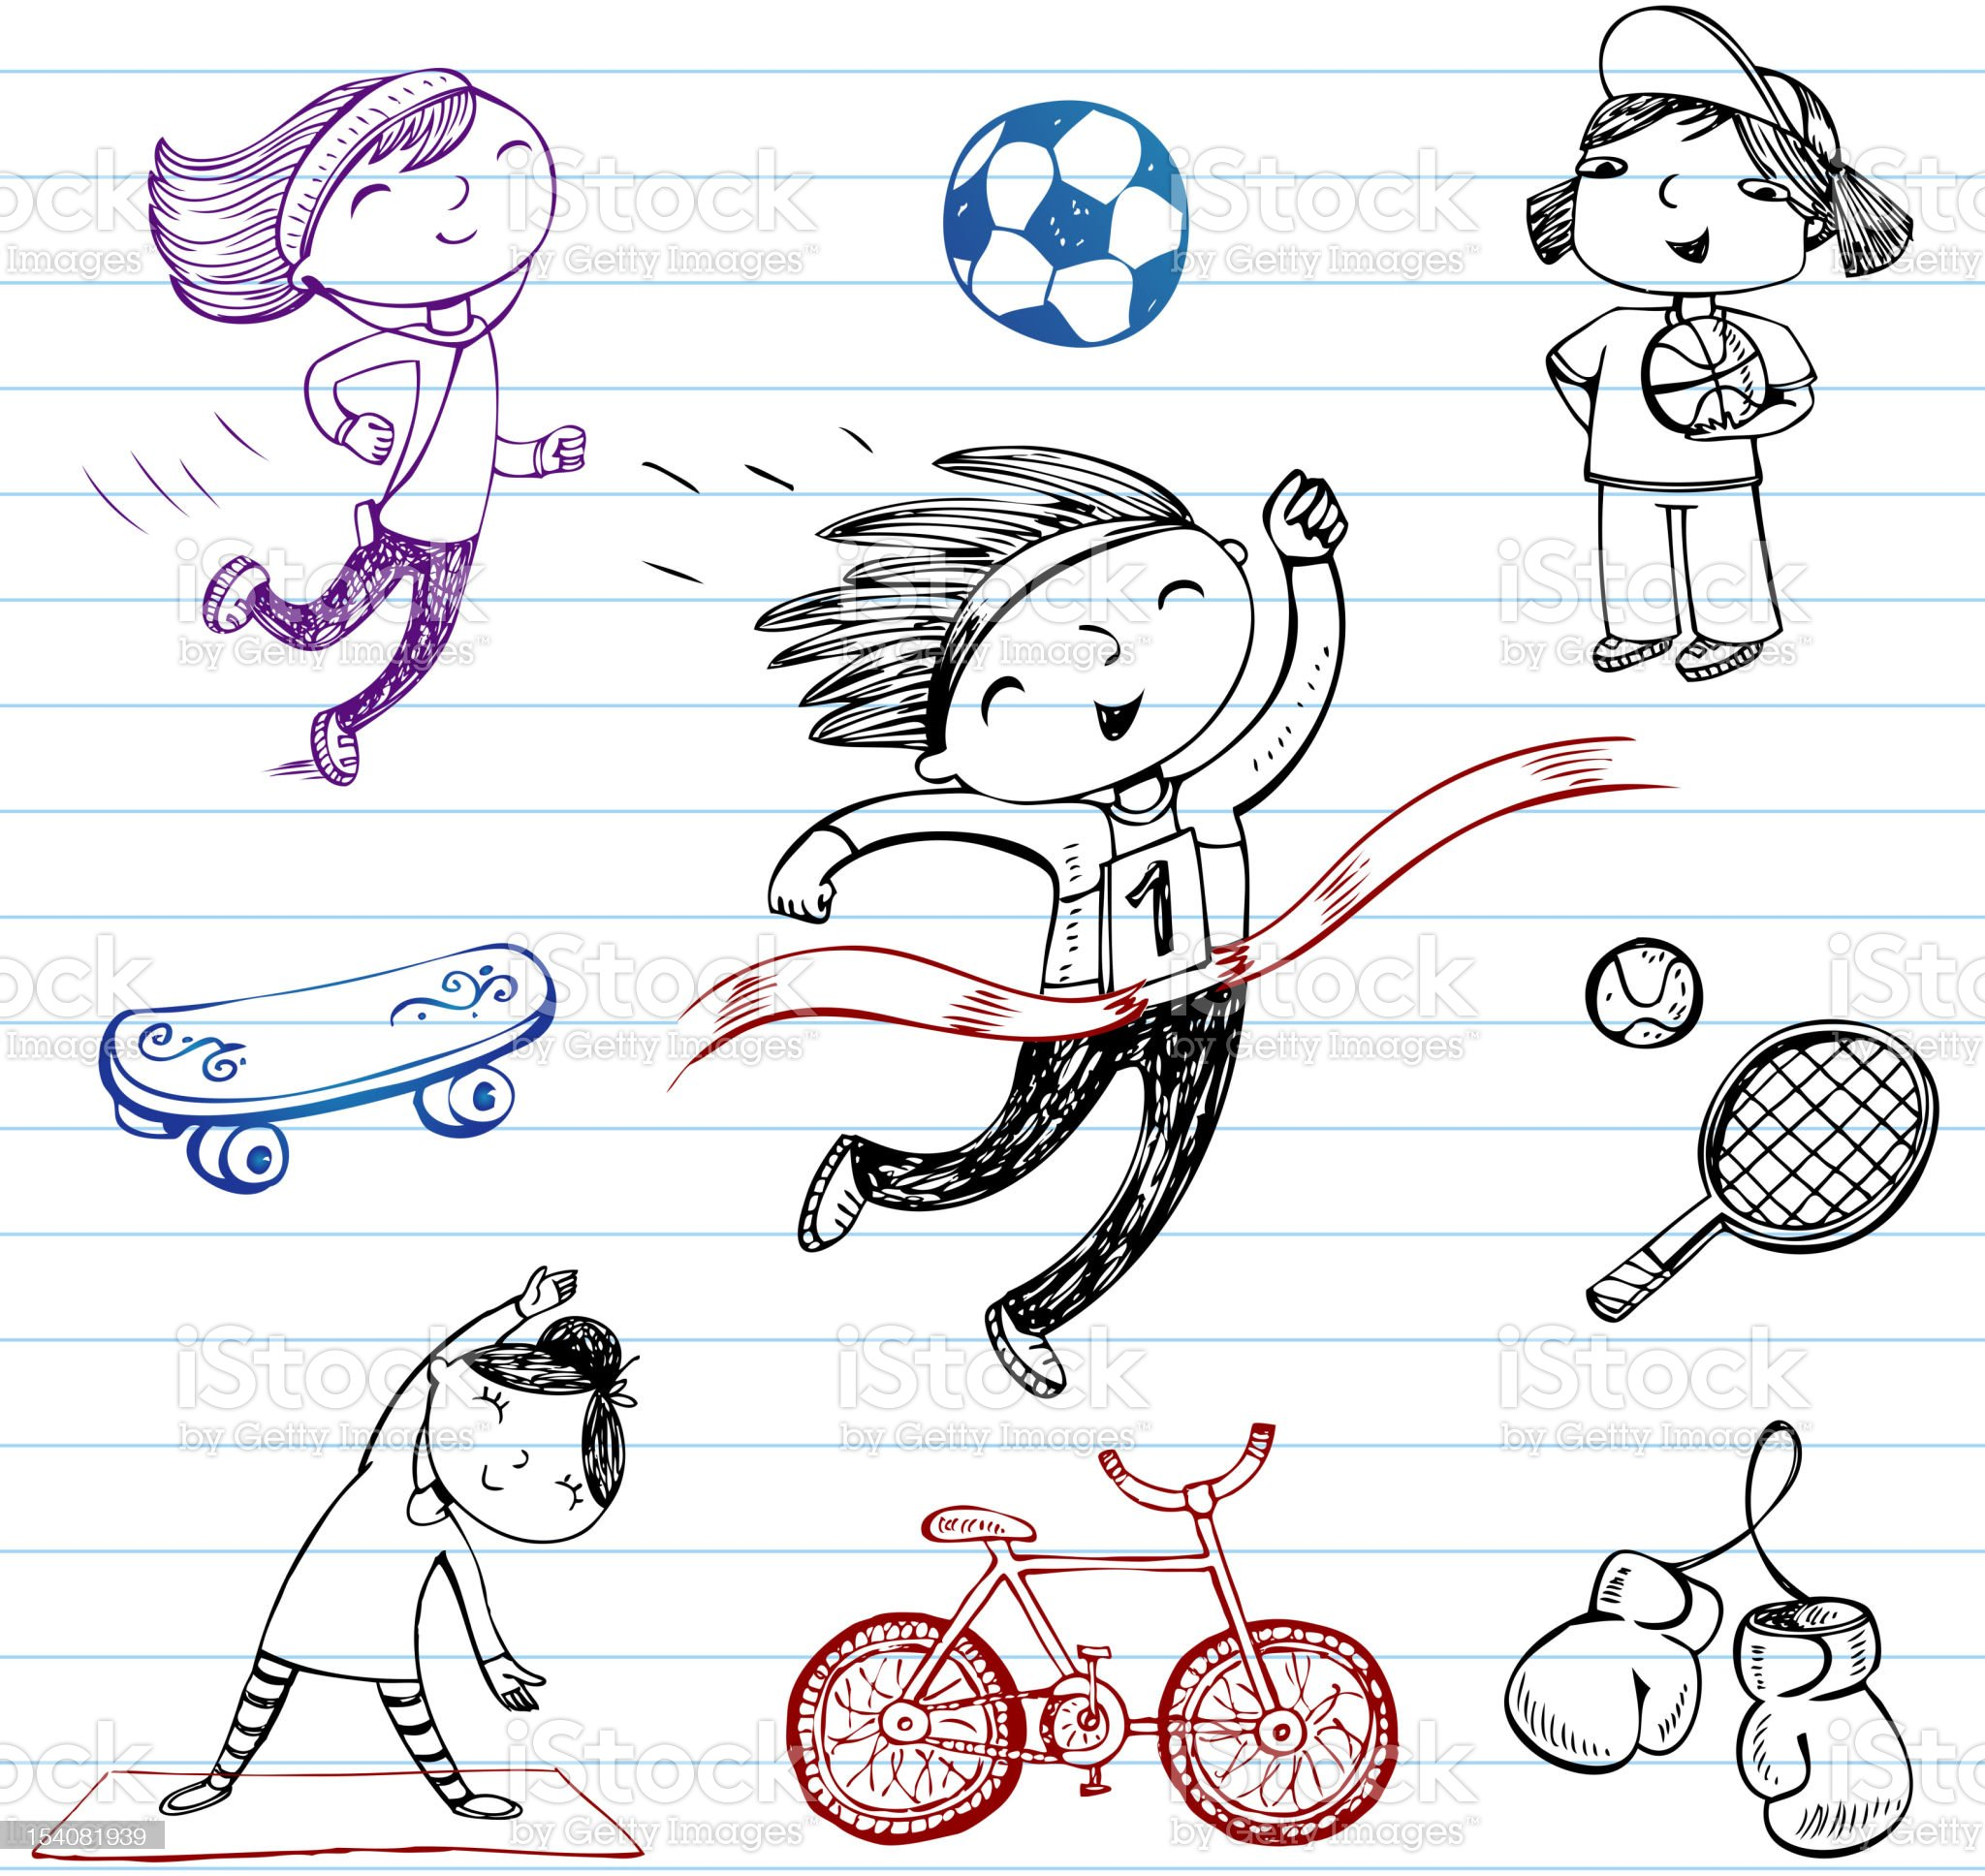 Sport doodle set royalty-free stock vector art